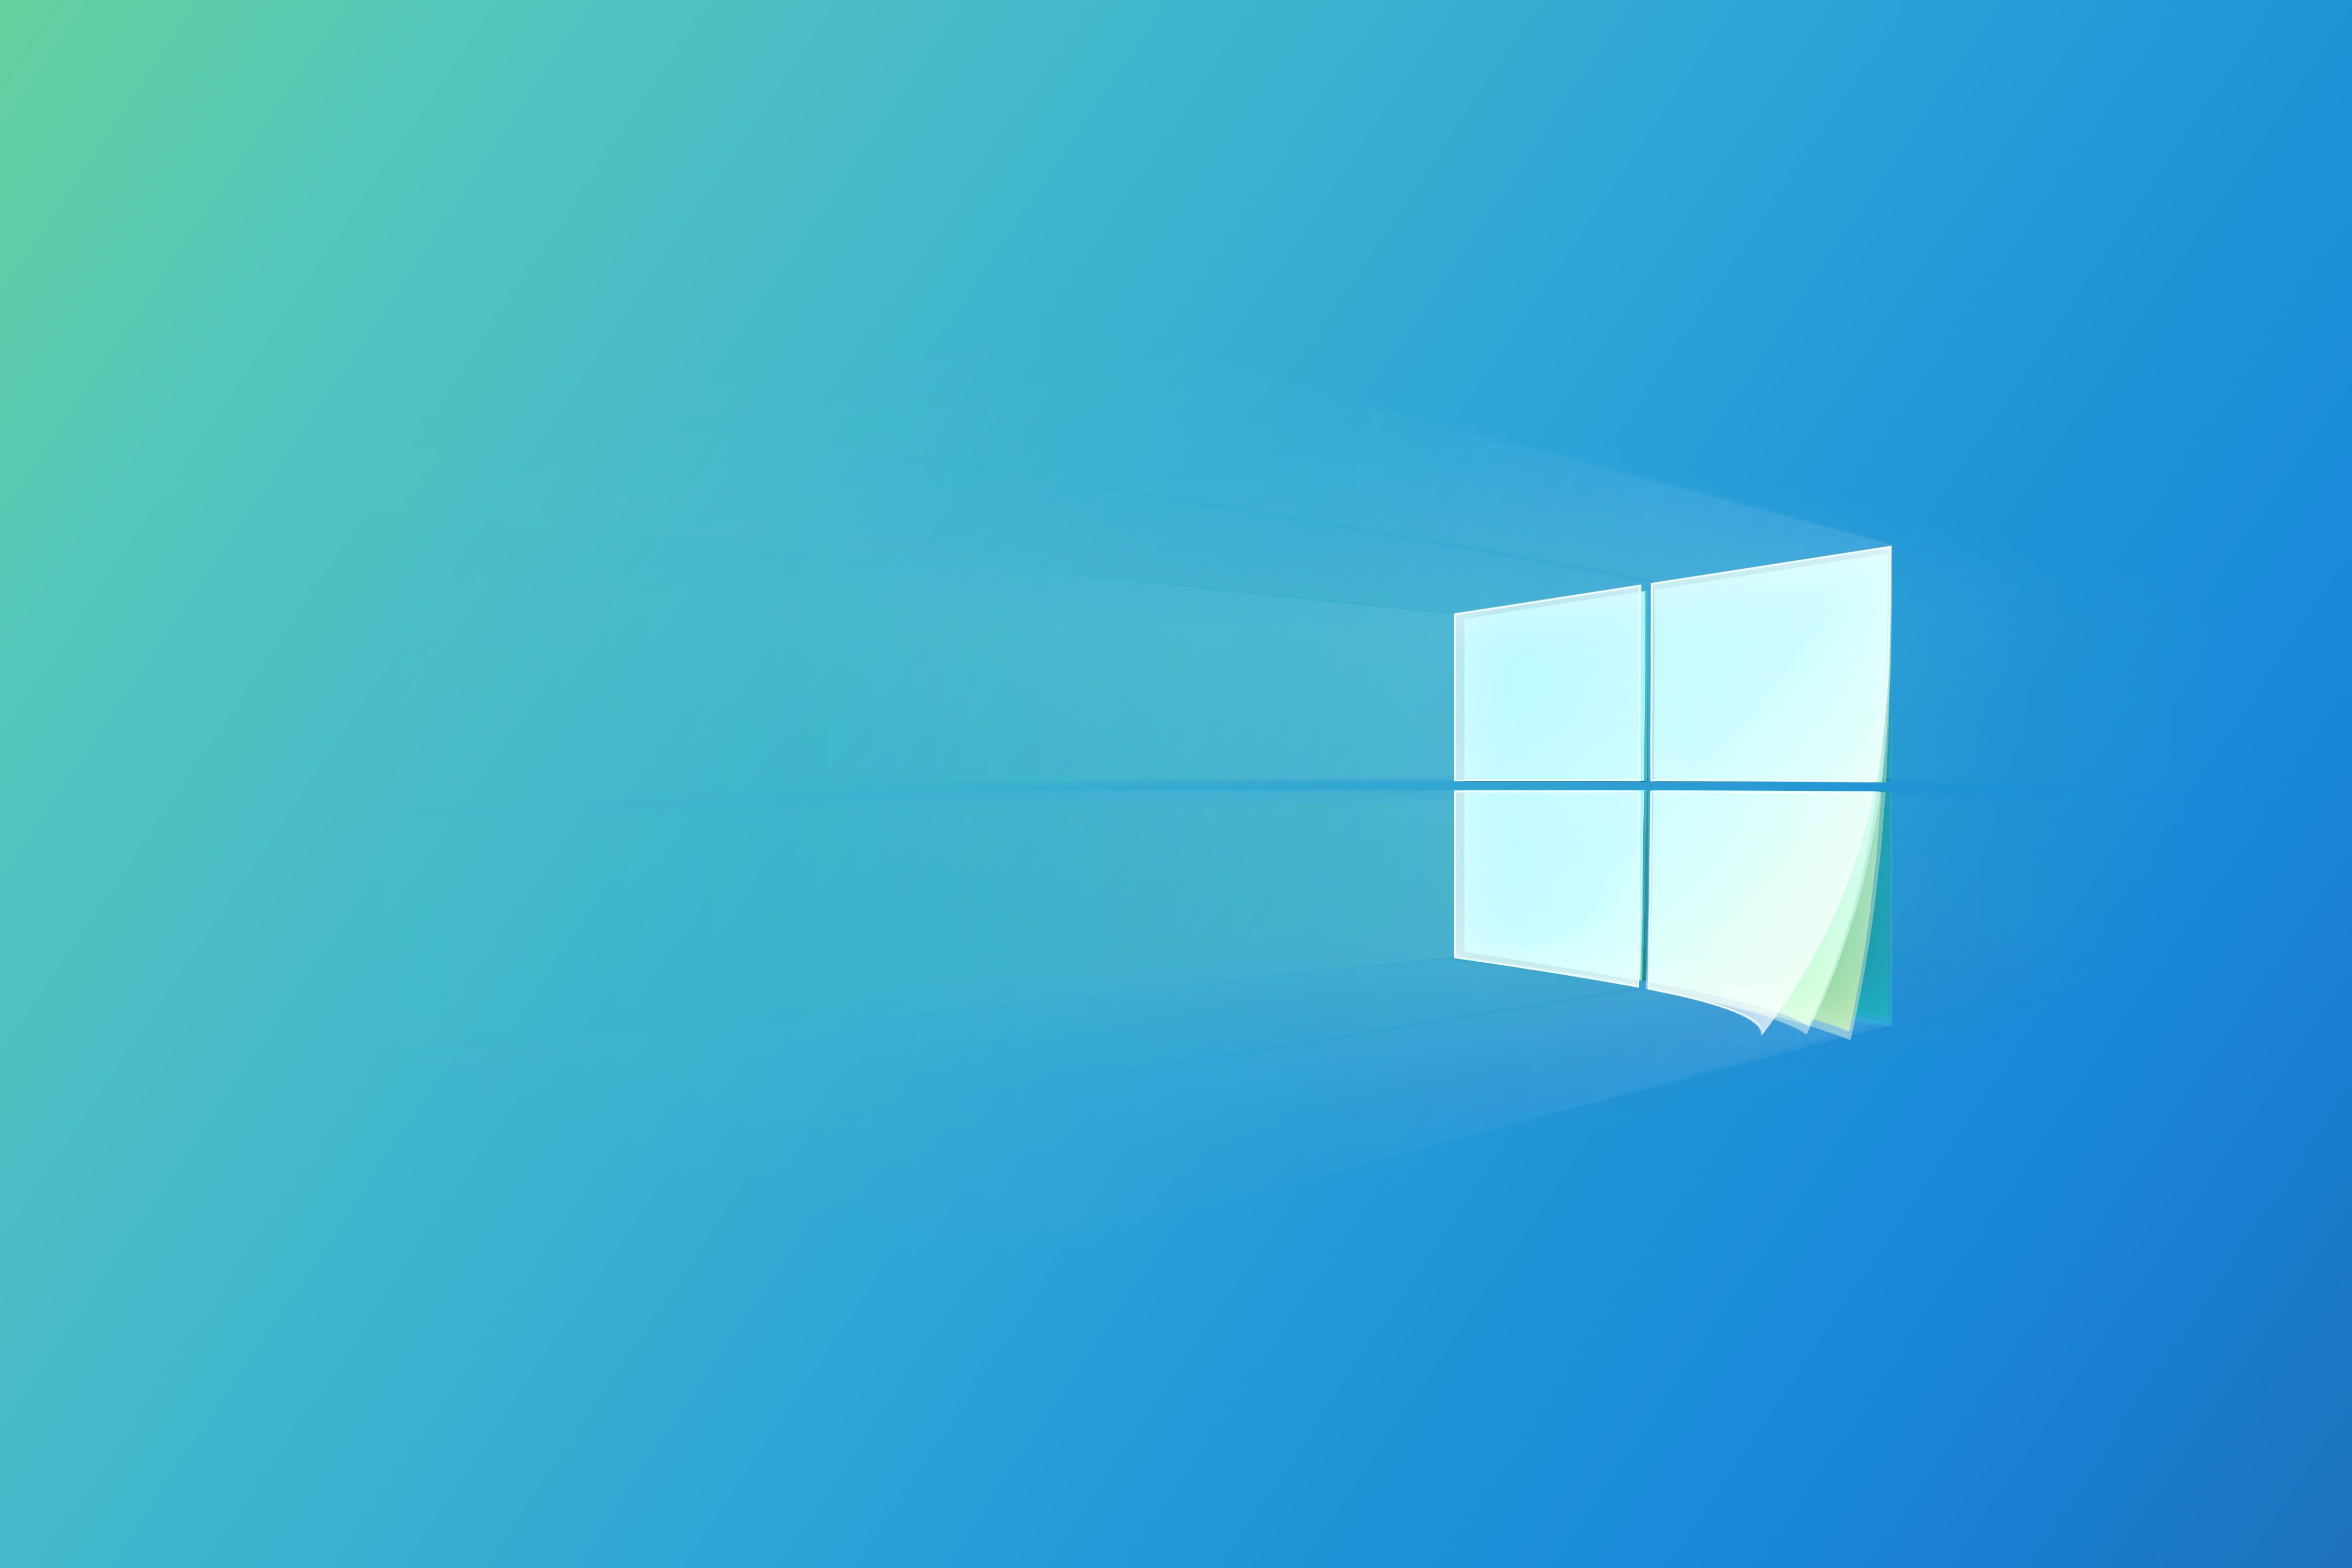 Windows 10 & Edge & Fluent background picture